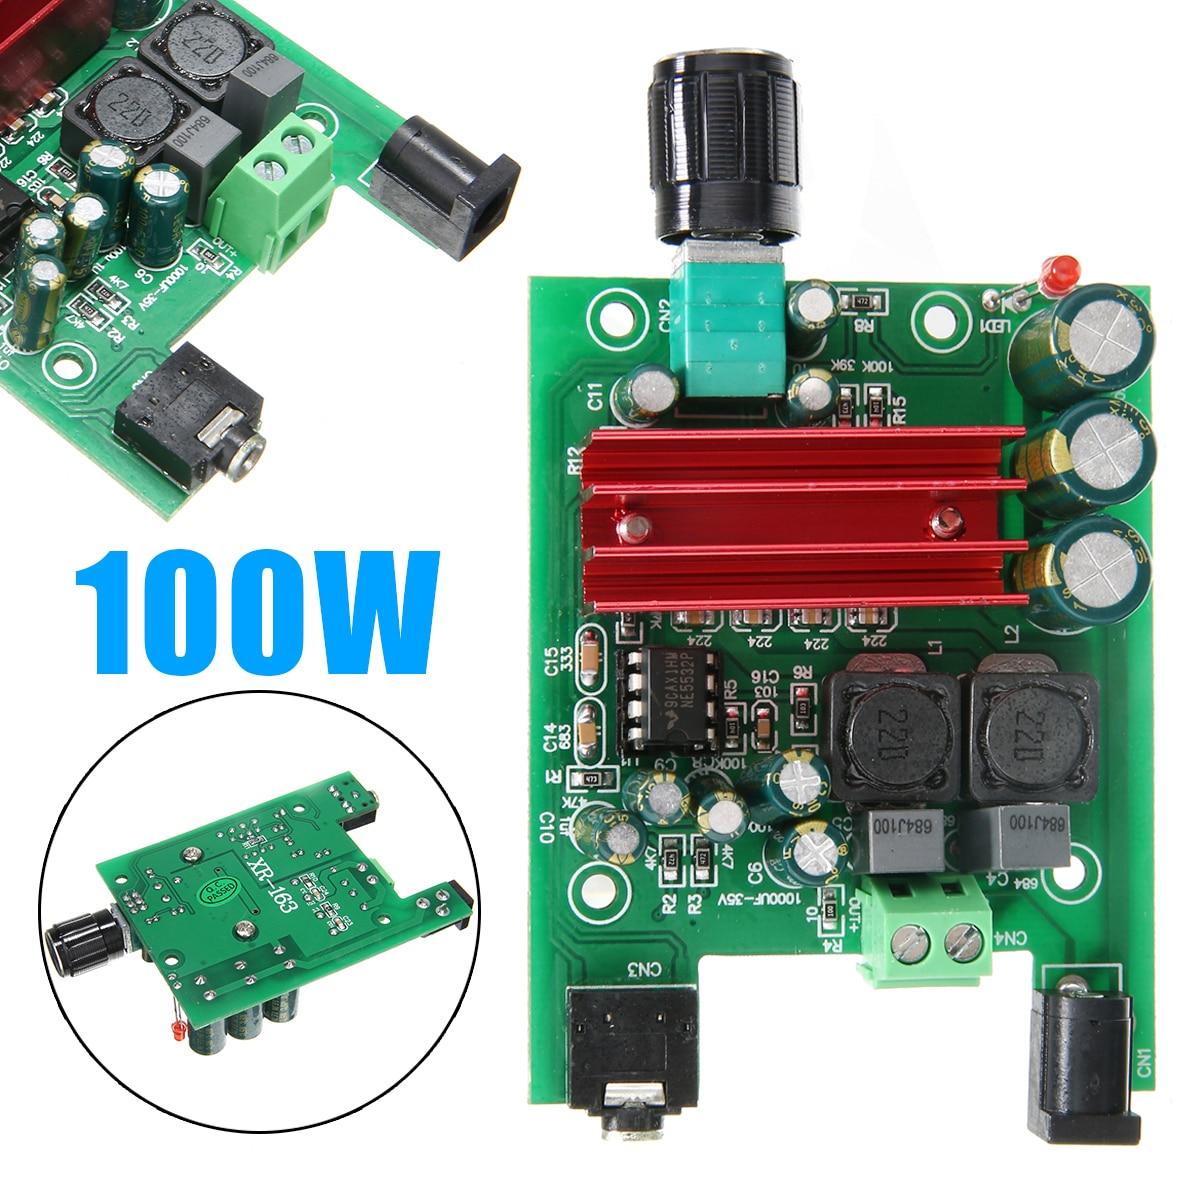 Newest 8-25V Digital Power Amplifier Boards Subwoofer Audio Module 100W+ 50W Dual-channel AMP Board For TPA3116D2